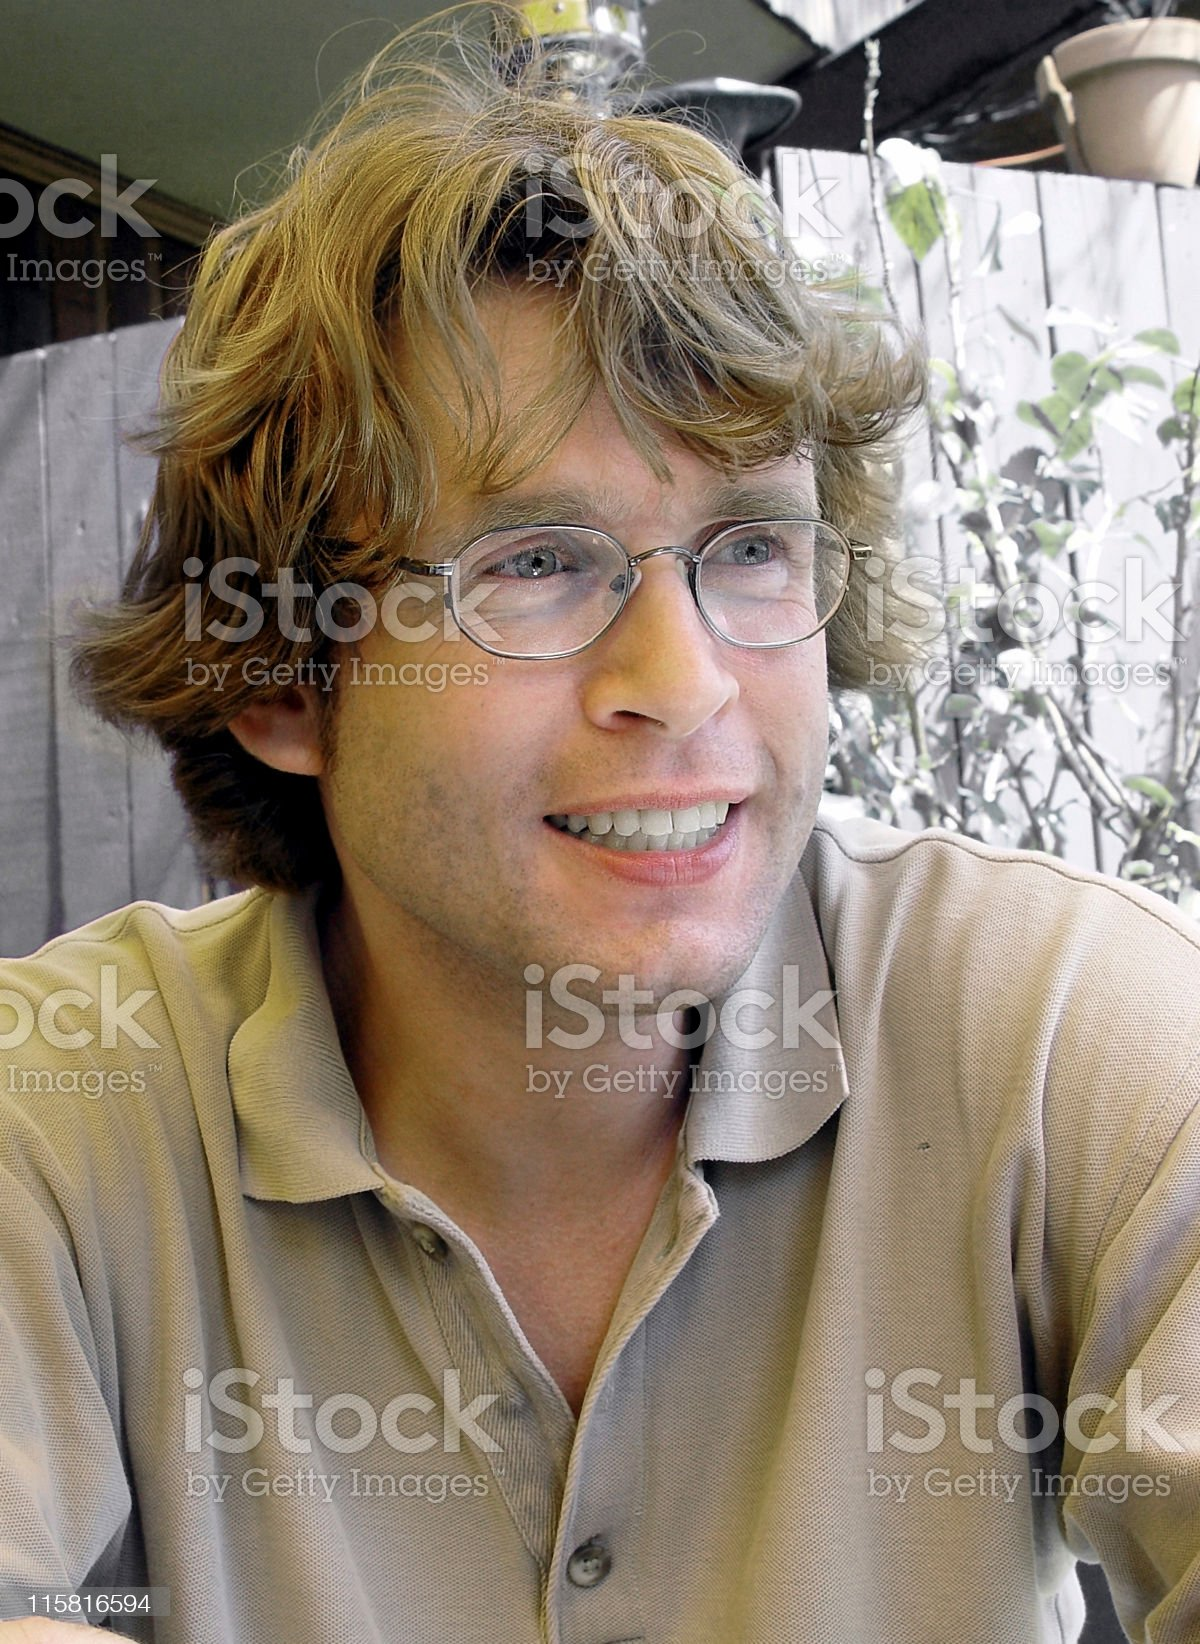 Blond guy royalty-free stock photo